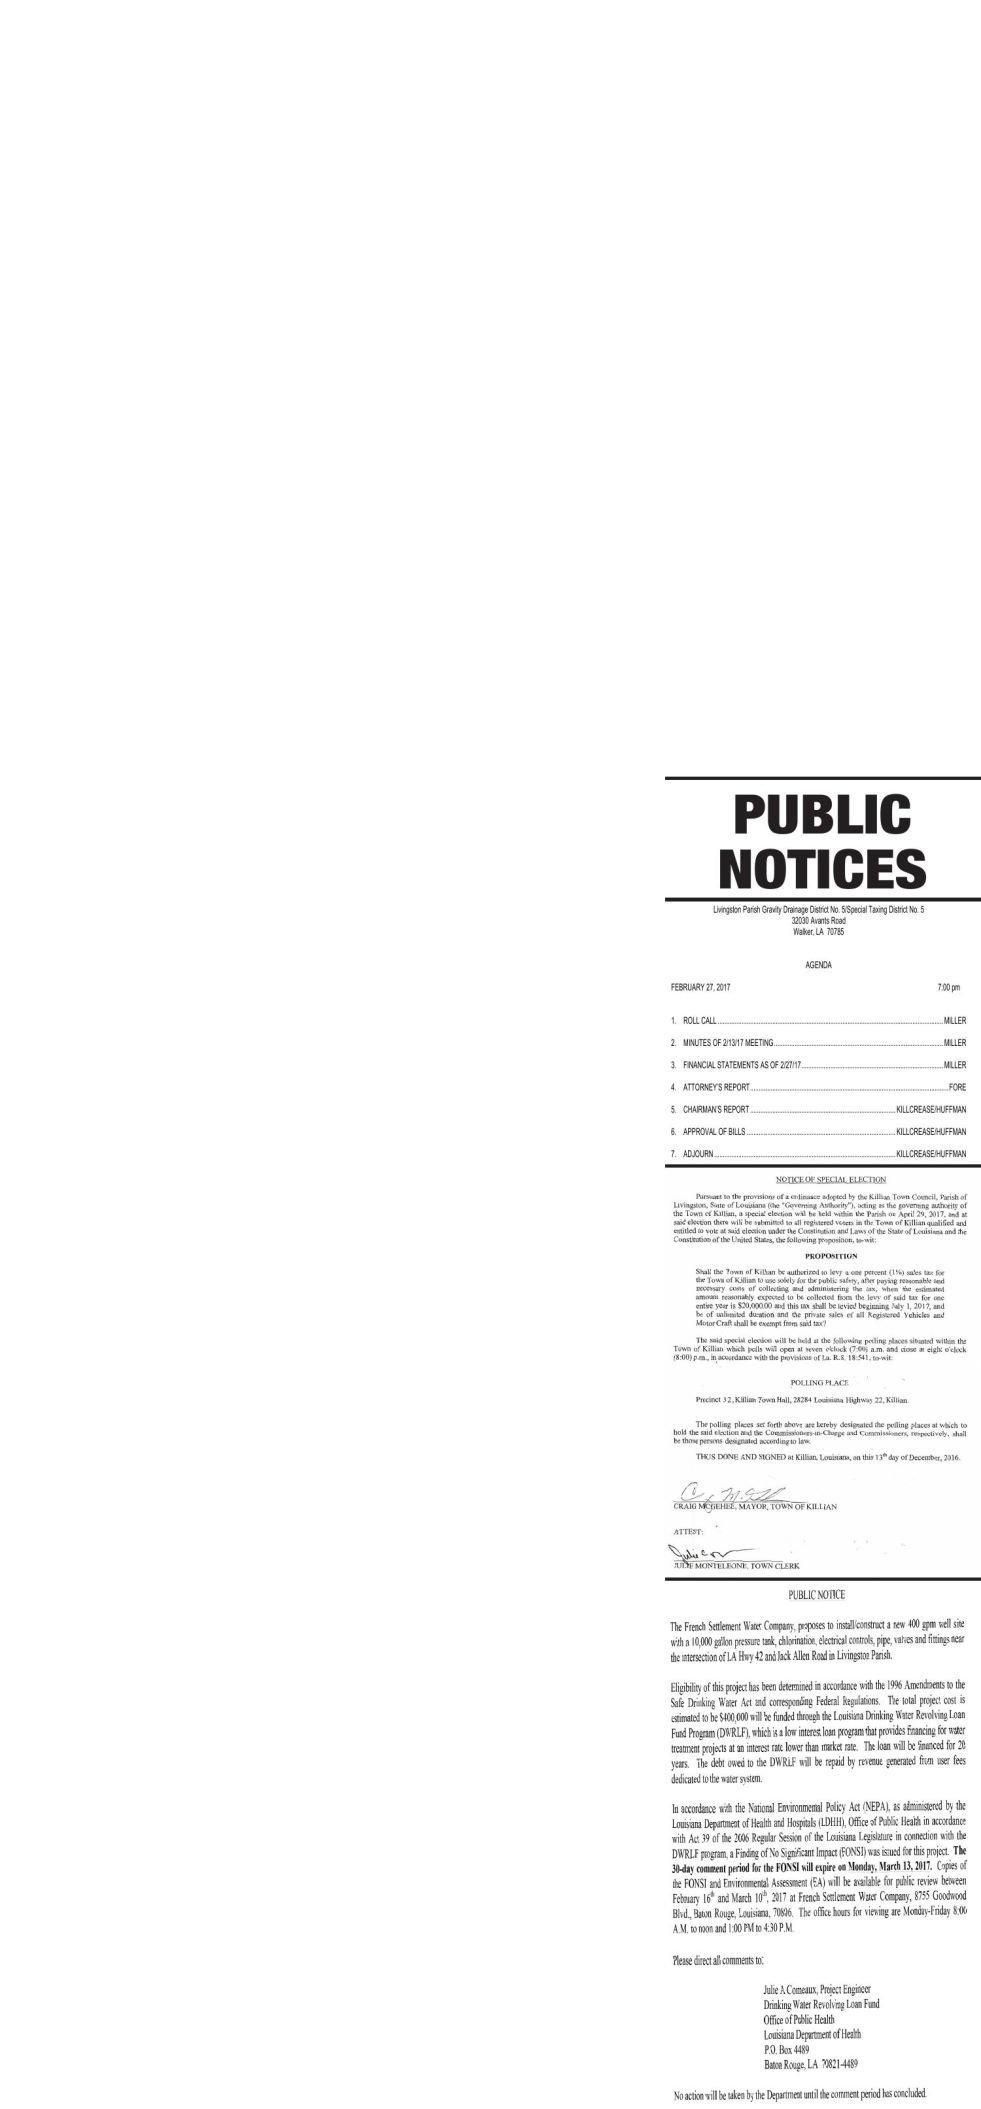 Public Notices published February 23, 2017